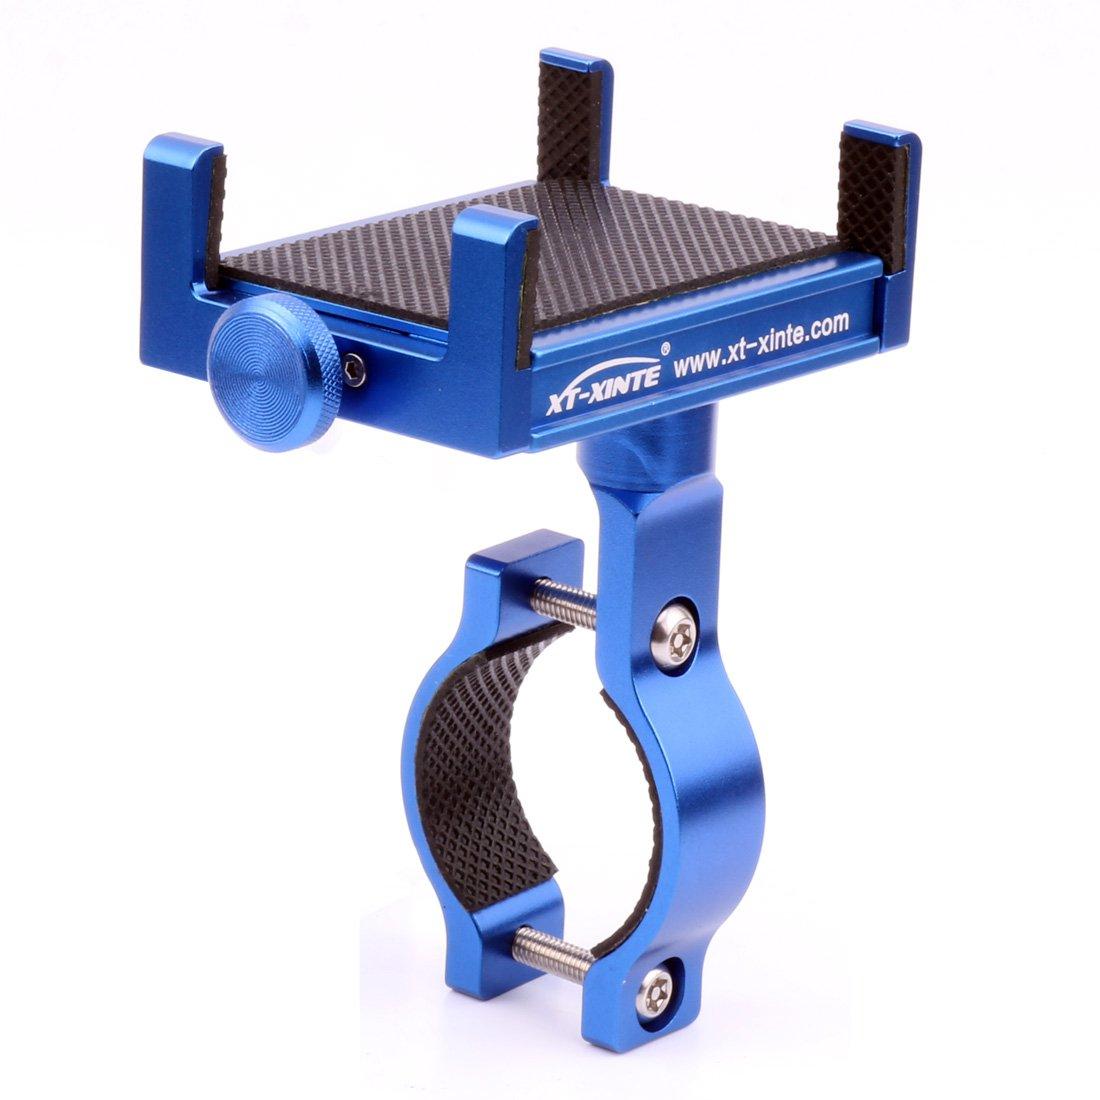 XT-XINTE Metall CNC Universal Handy Halter montieren Fahrrad Griffhalter Motorrad Lenkerhalterung Bicycle Phone Holder